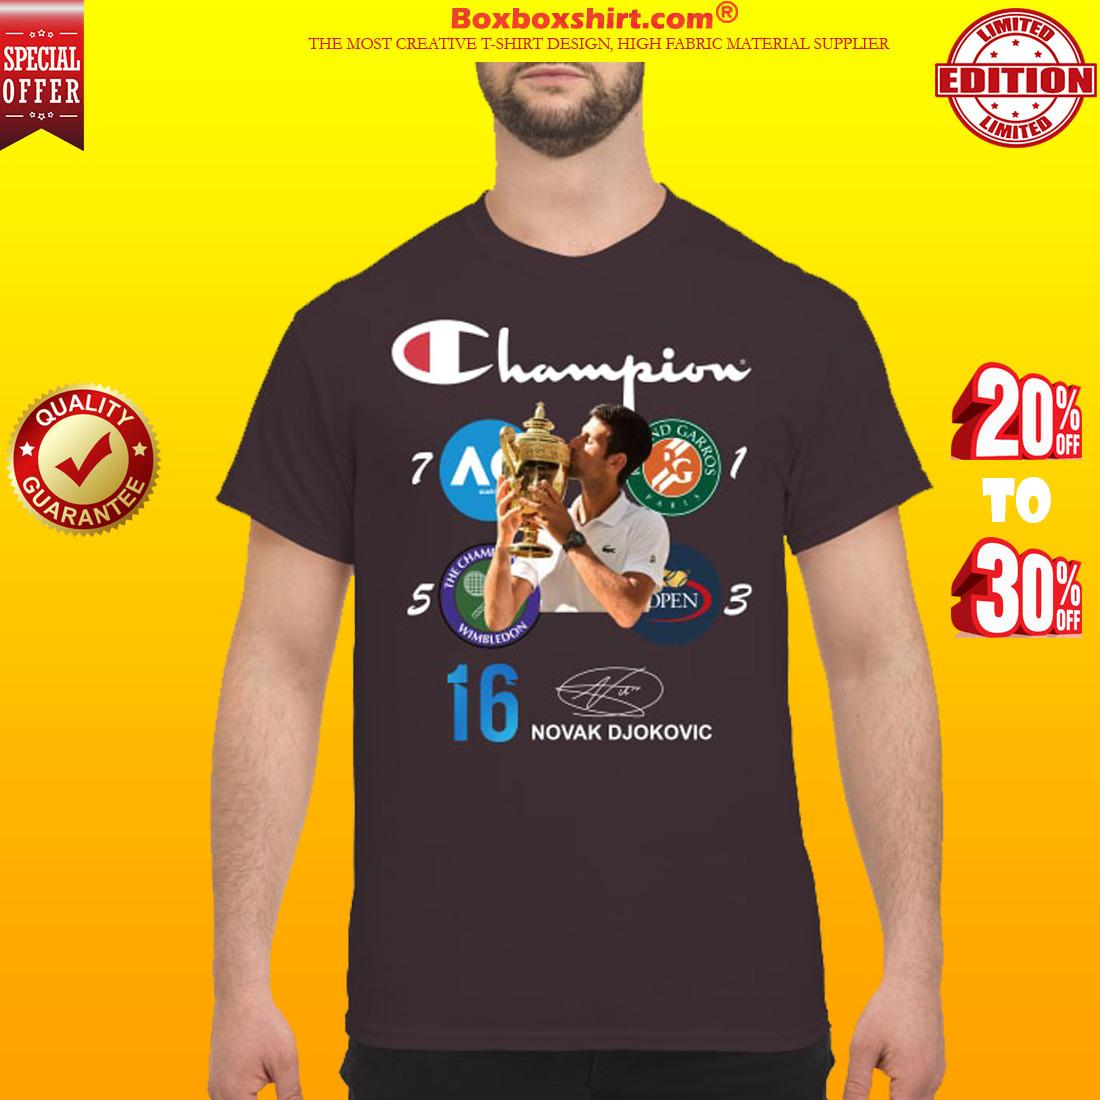 Wimbledon Champion Novak Djokovic 16th grand slam shirt